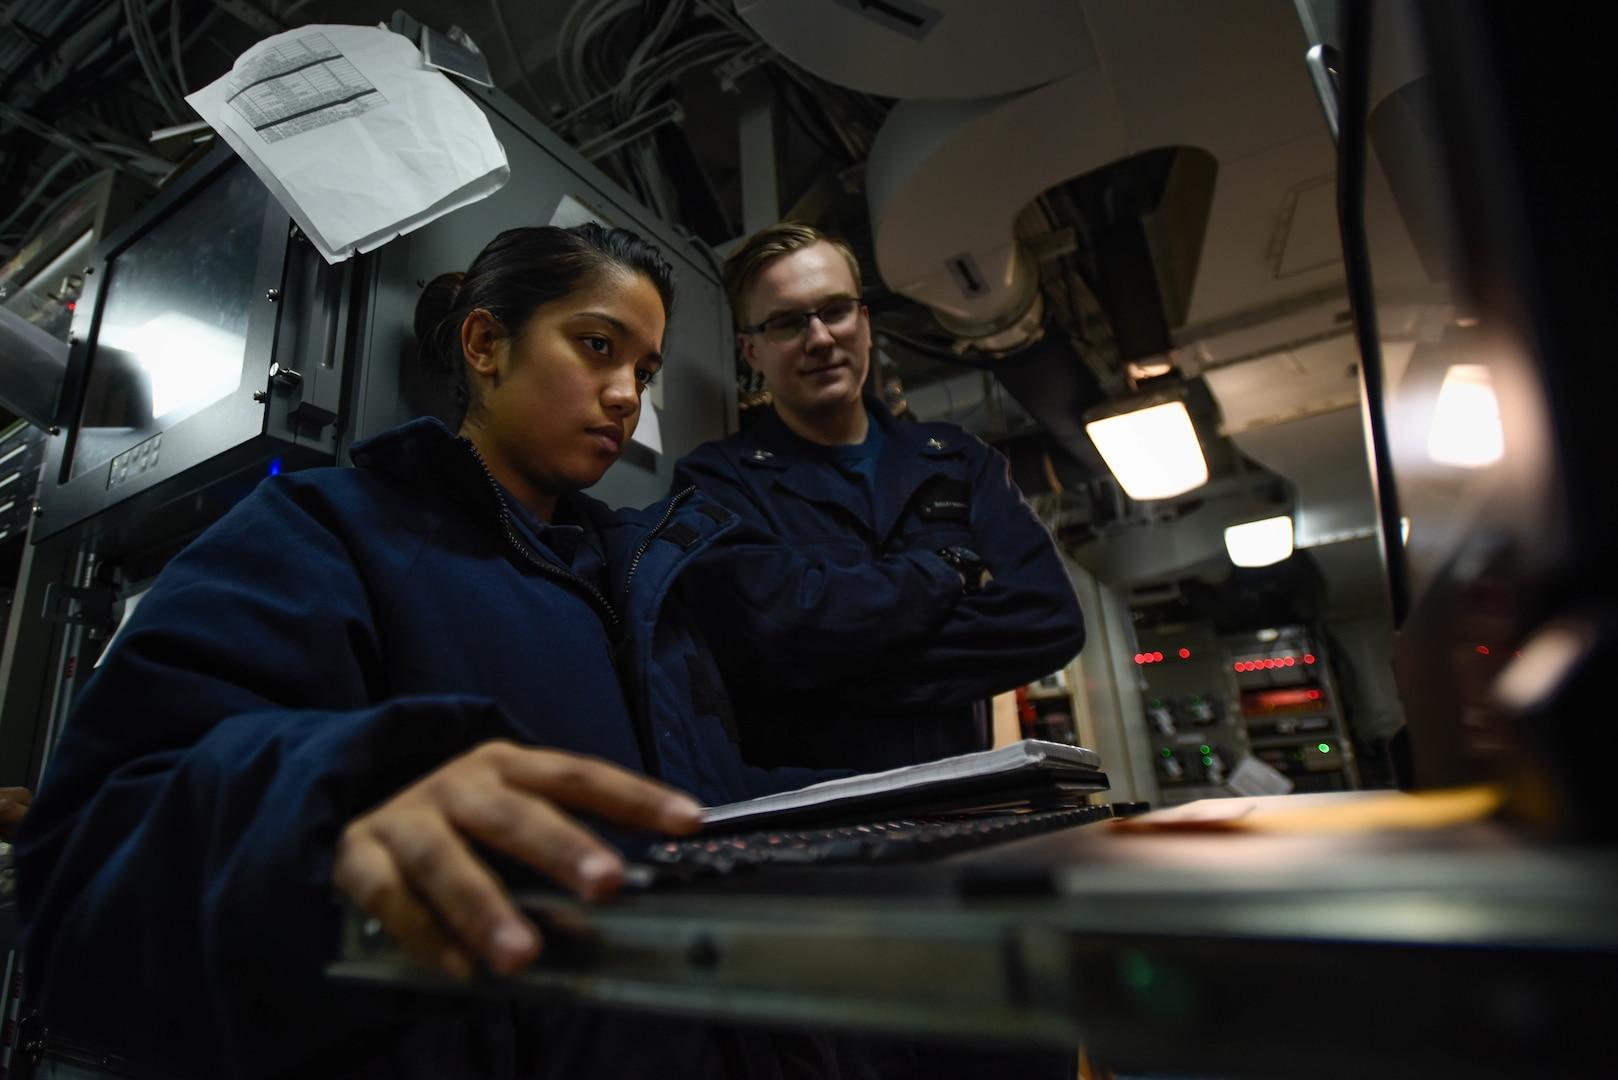 Information Systems Technicians monitor communication systems aboard USS Theodore Roosevelt, January 2018, Arabian Gulf (U.S. Navy/Alex Corona)